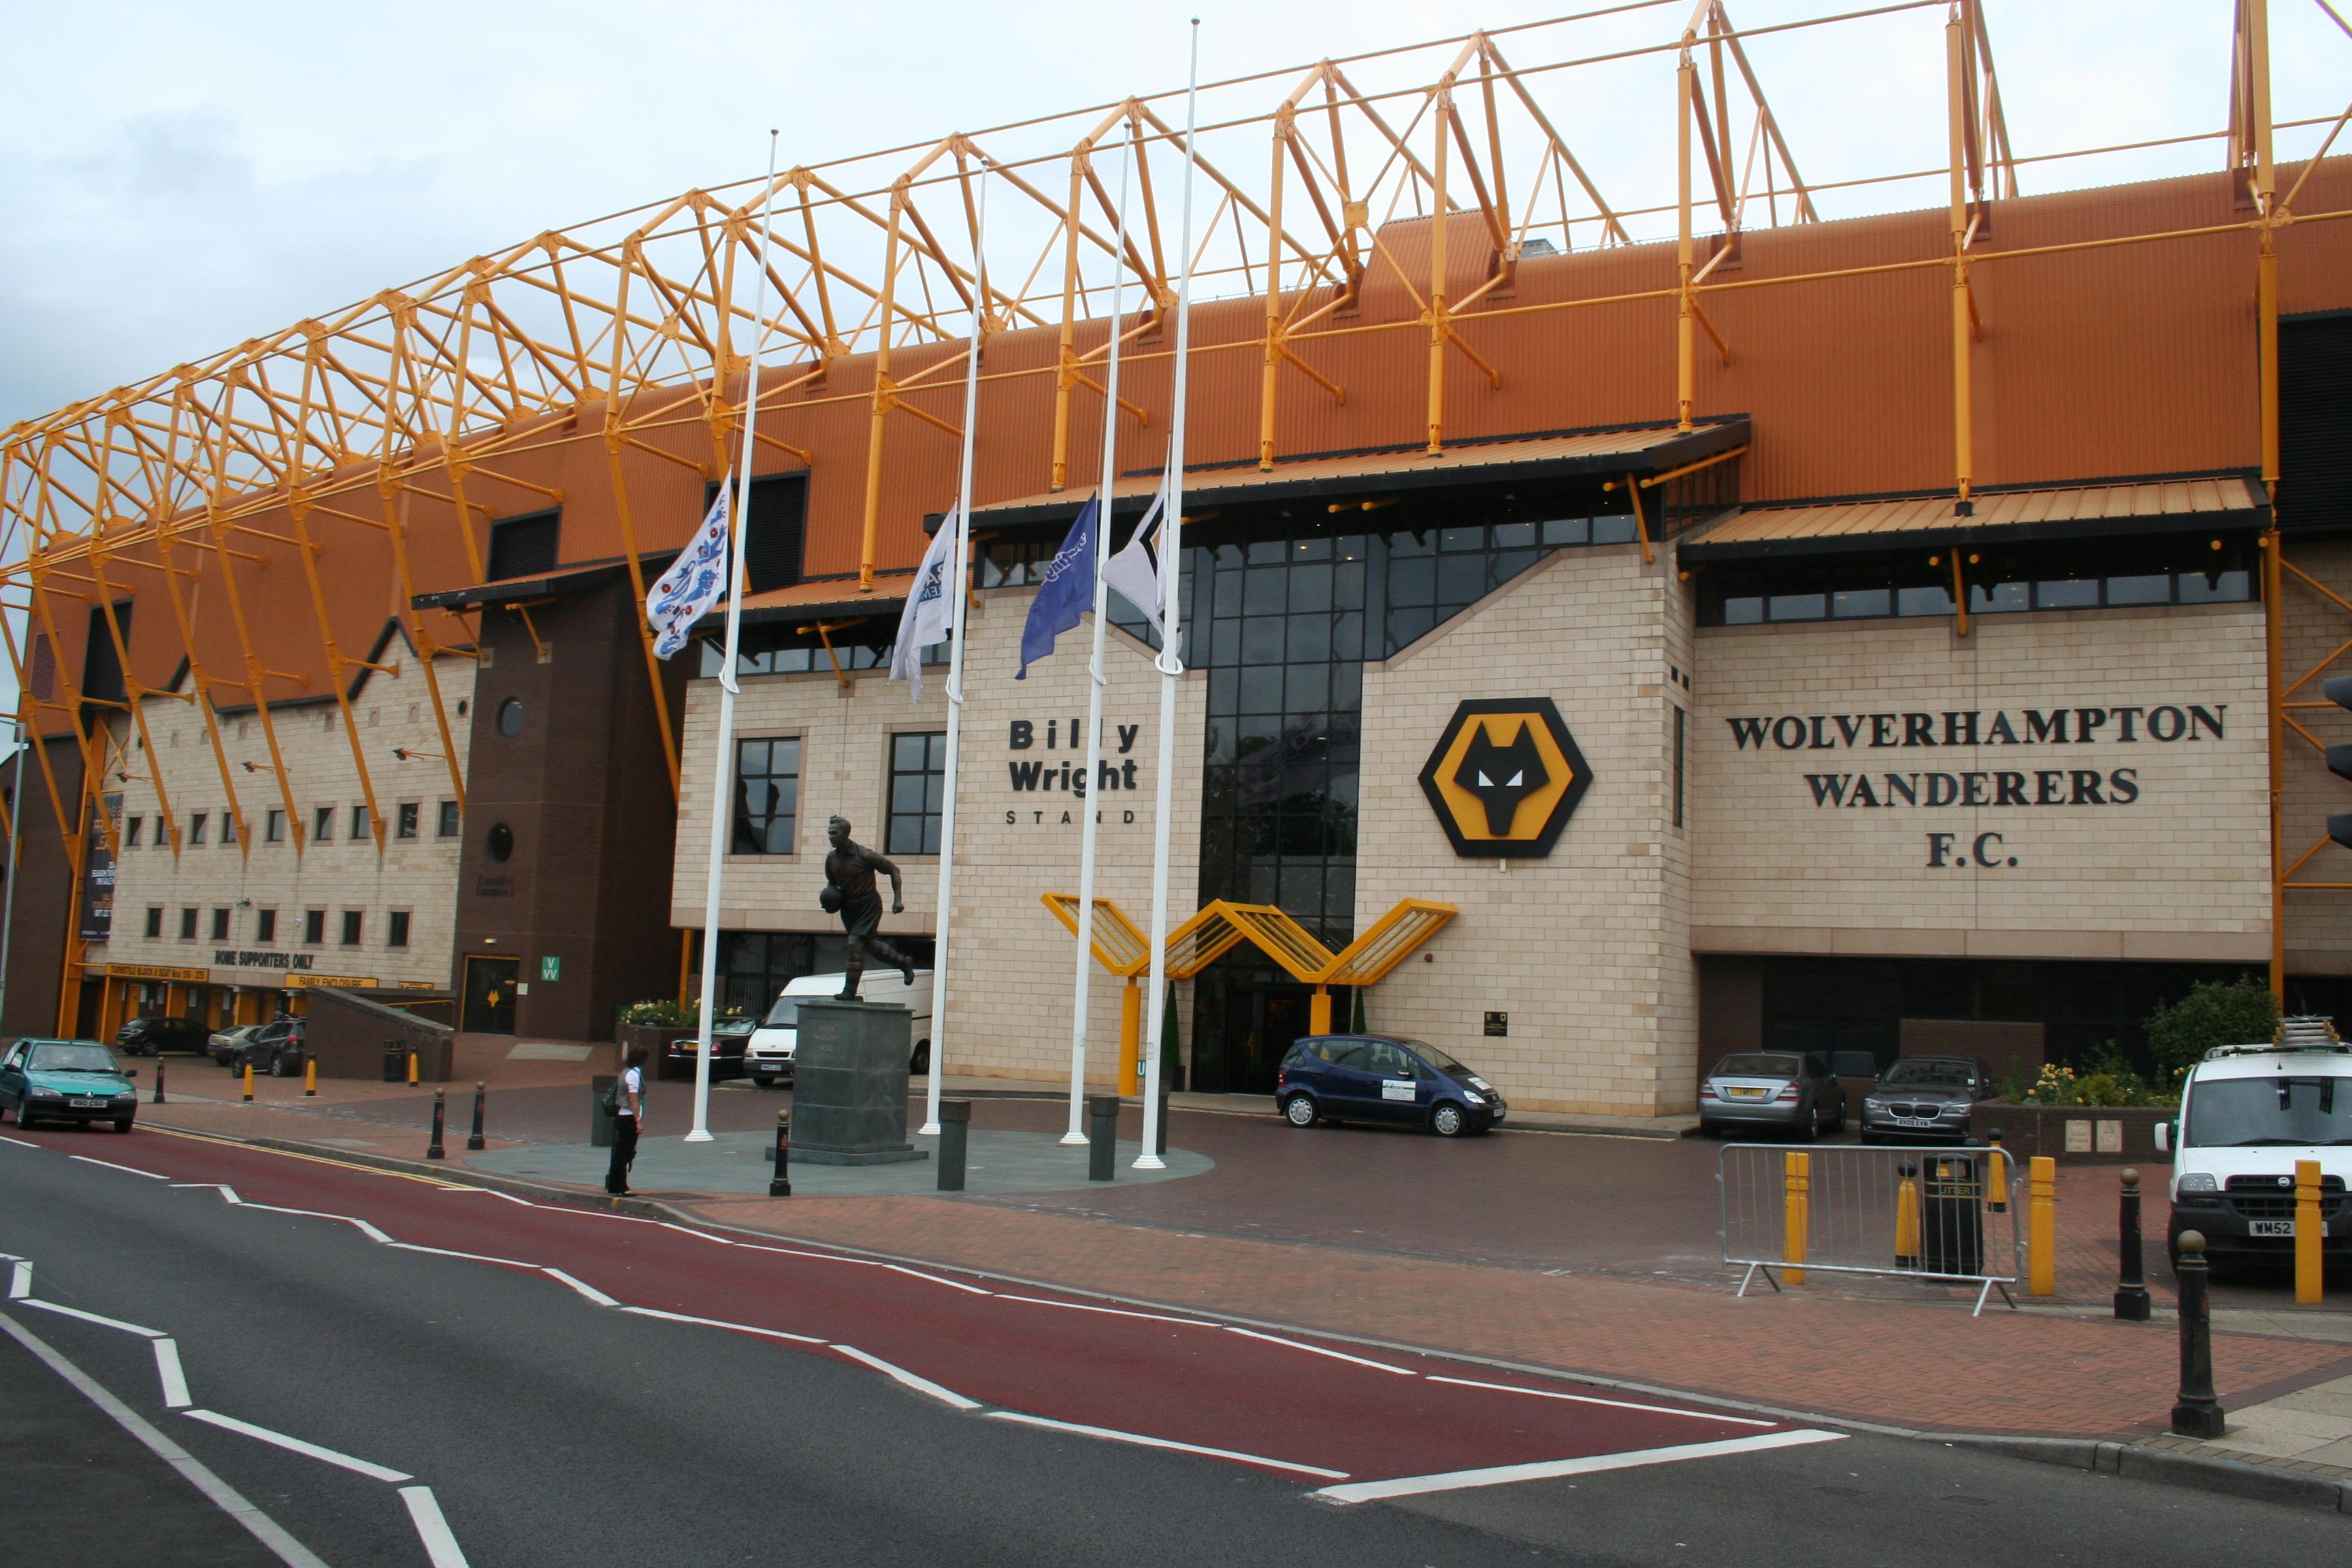 Wolverhampton Wanderers Football Club Lgm Limited